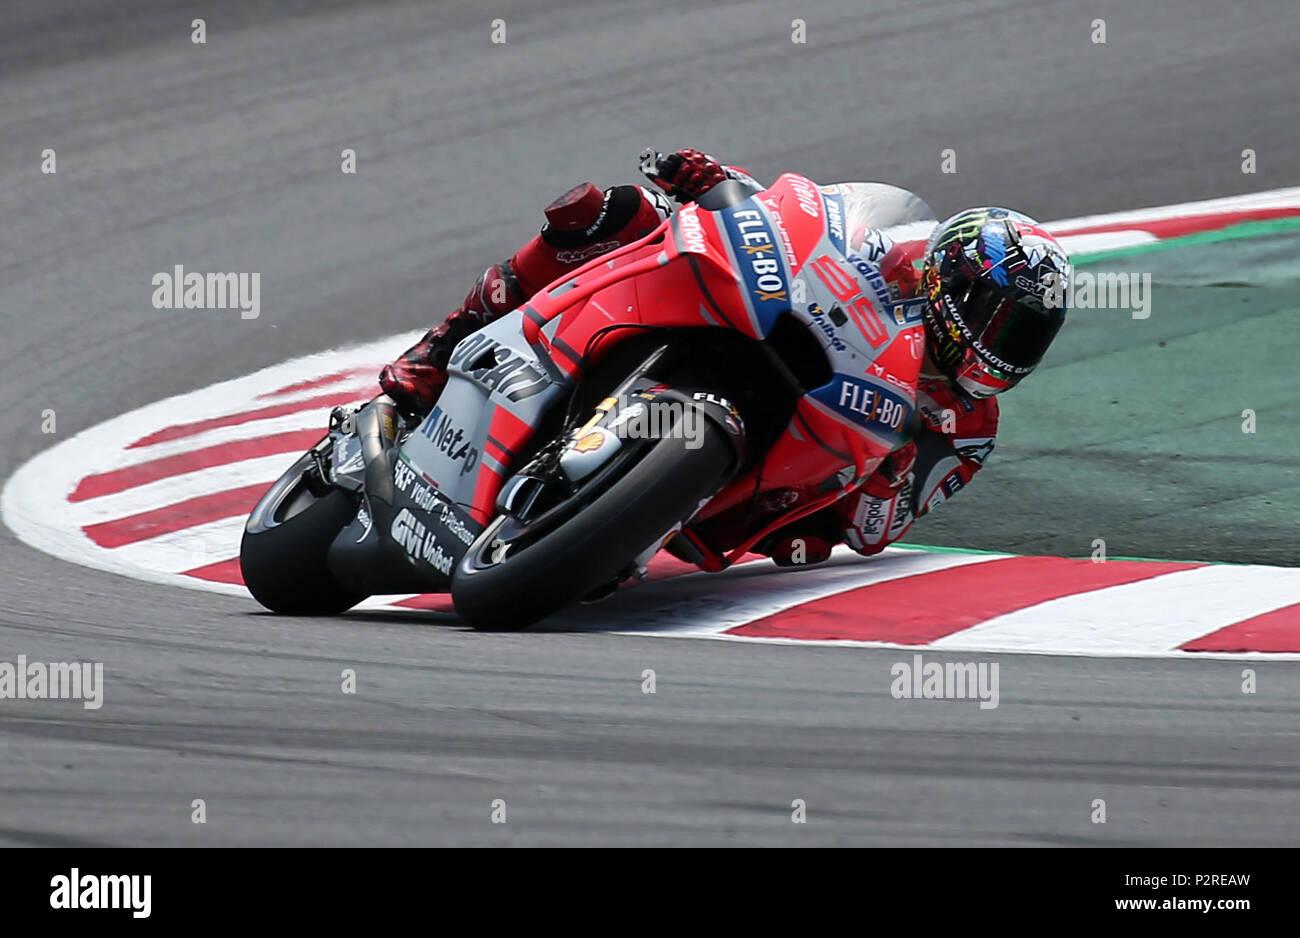 Barcelona -16th June 2018- SPAIN: Jorge Lorenzo (Ducati) during the free practice of the GP Catalunya Moto GP, in the Barcelona-Catalunya Circuit, on 16th June 2018. Photo: Joan Valls/Urbanandsport/Cordon Press - Stock Image